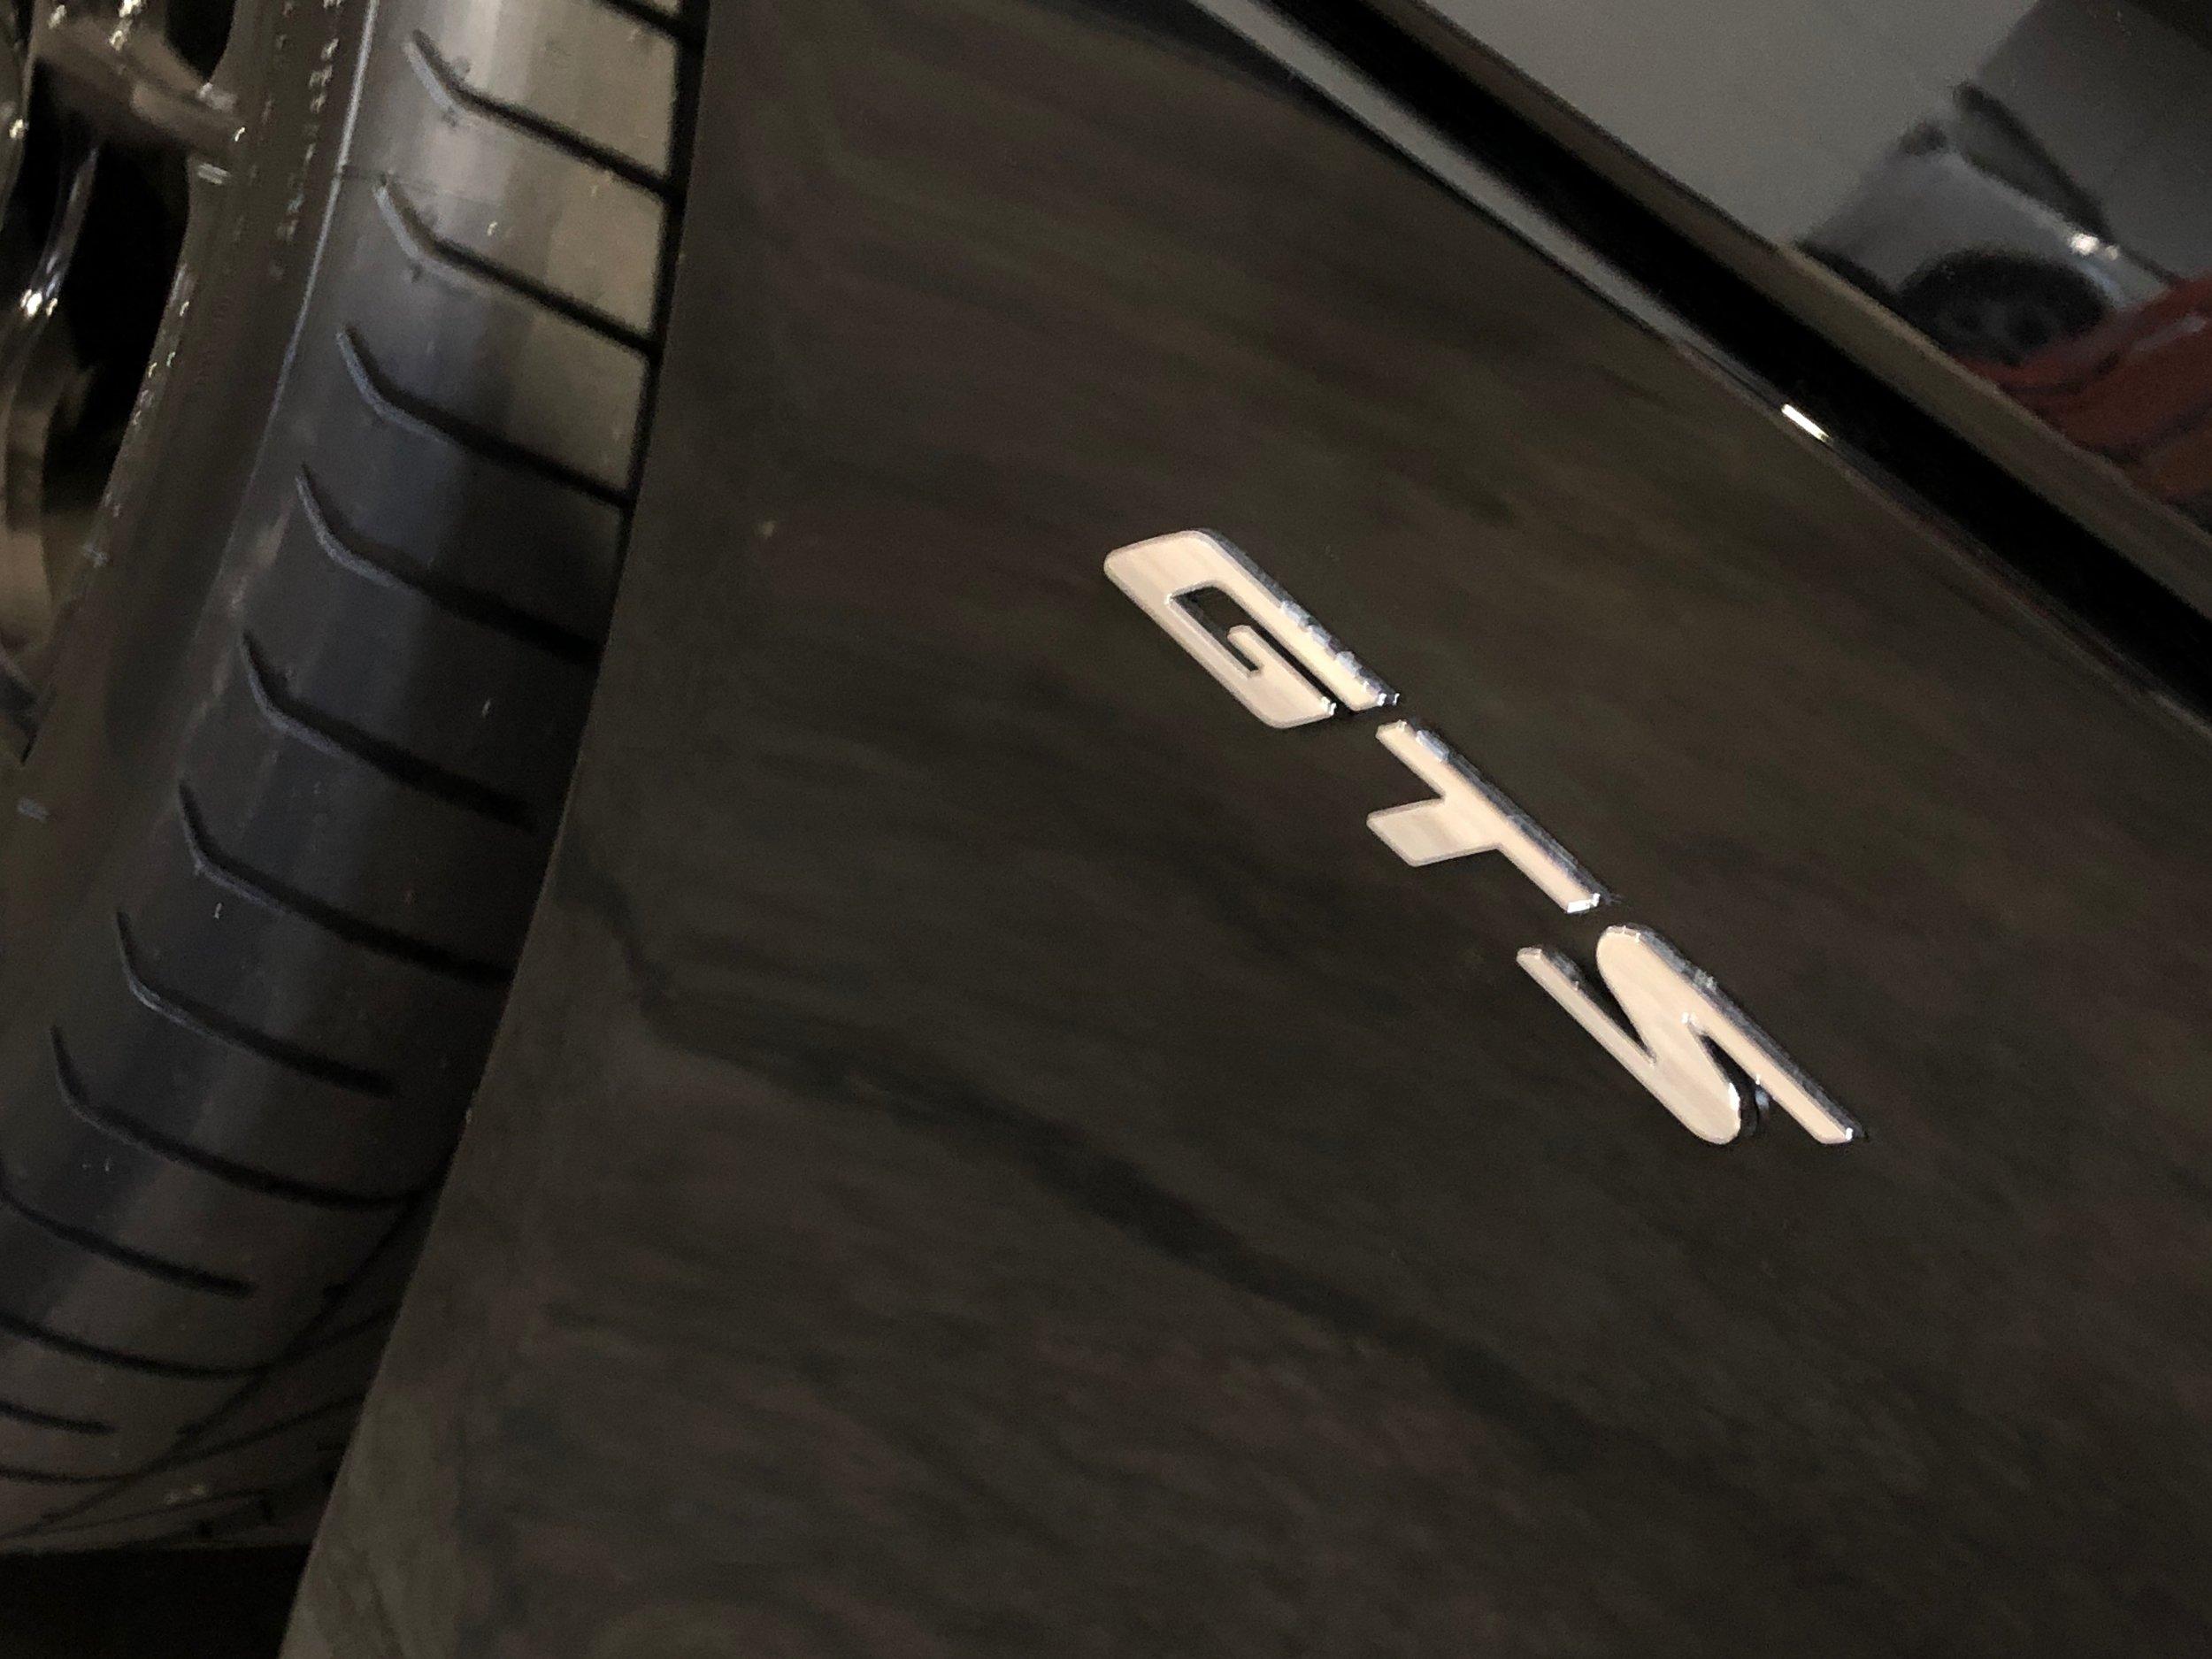 2014 Dodge Viper GTS Wheel